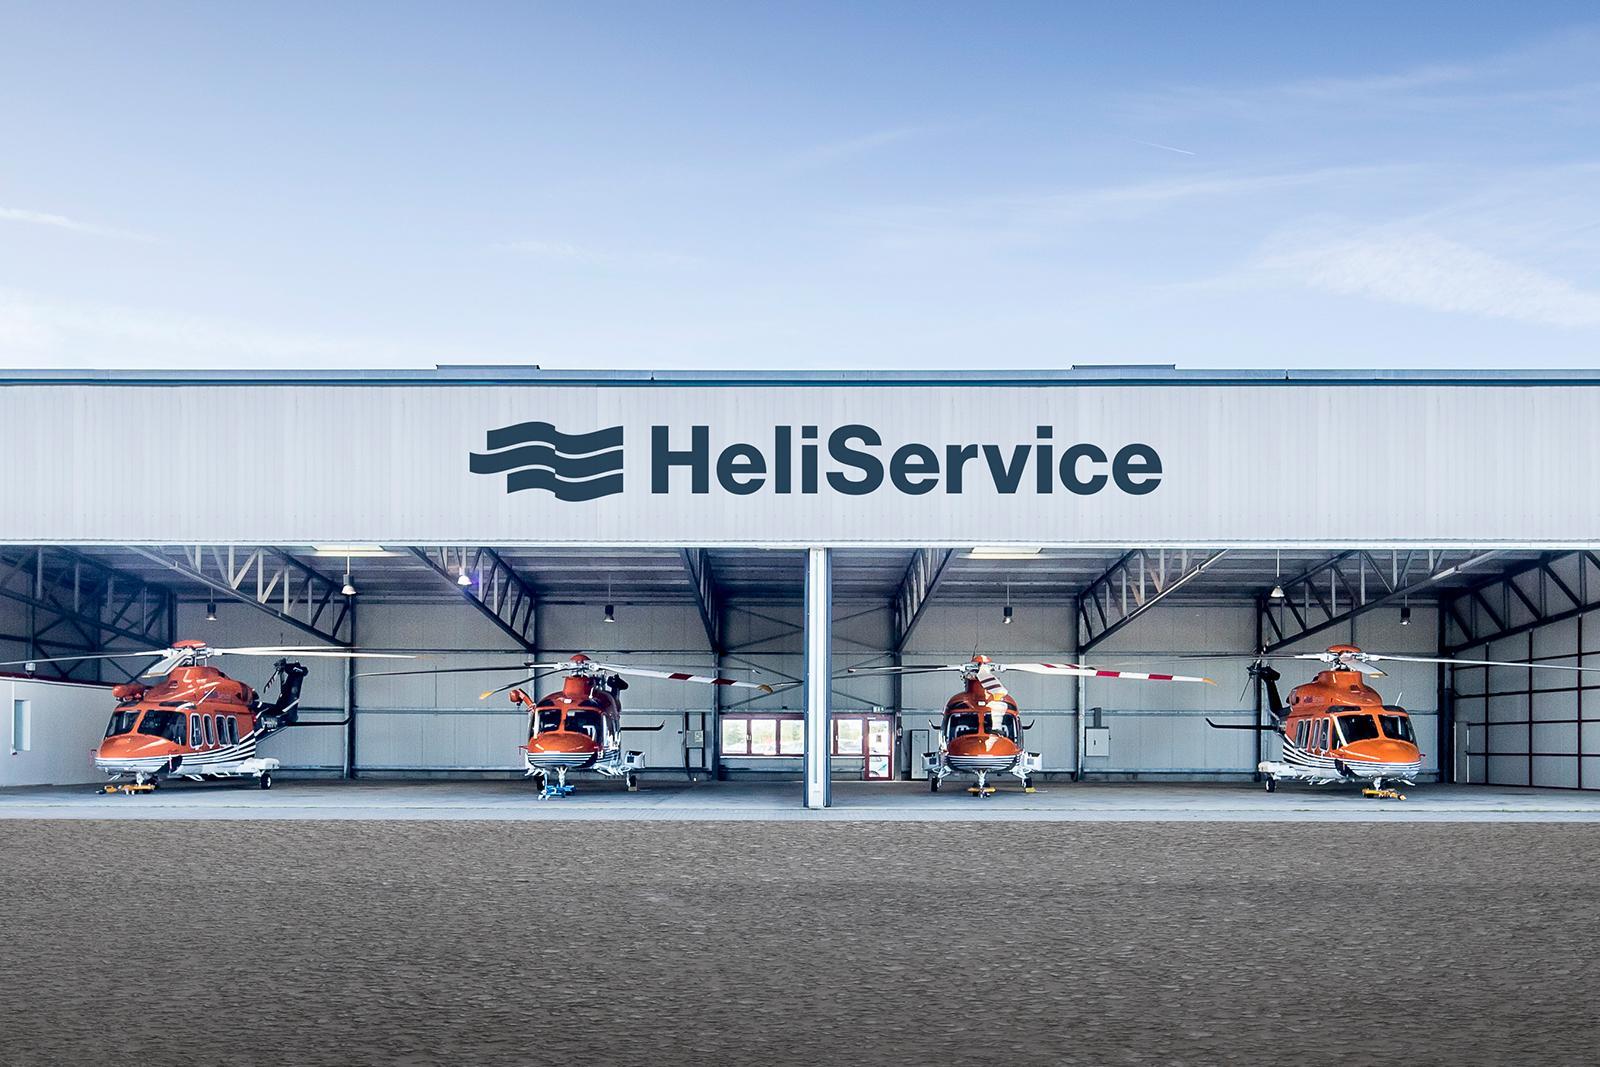 HeliService